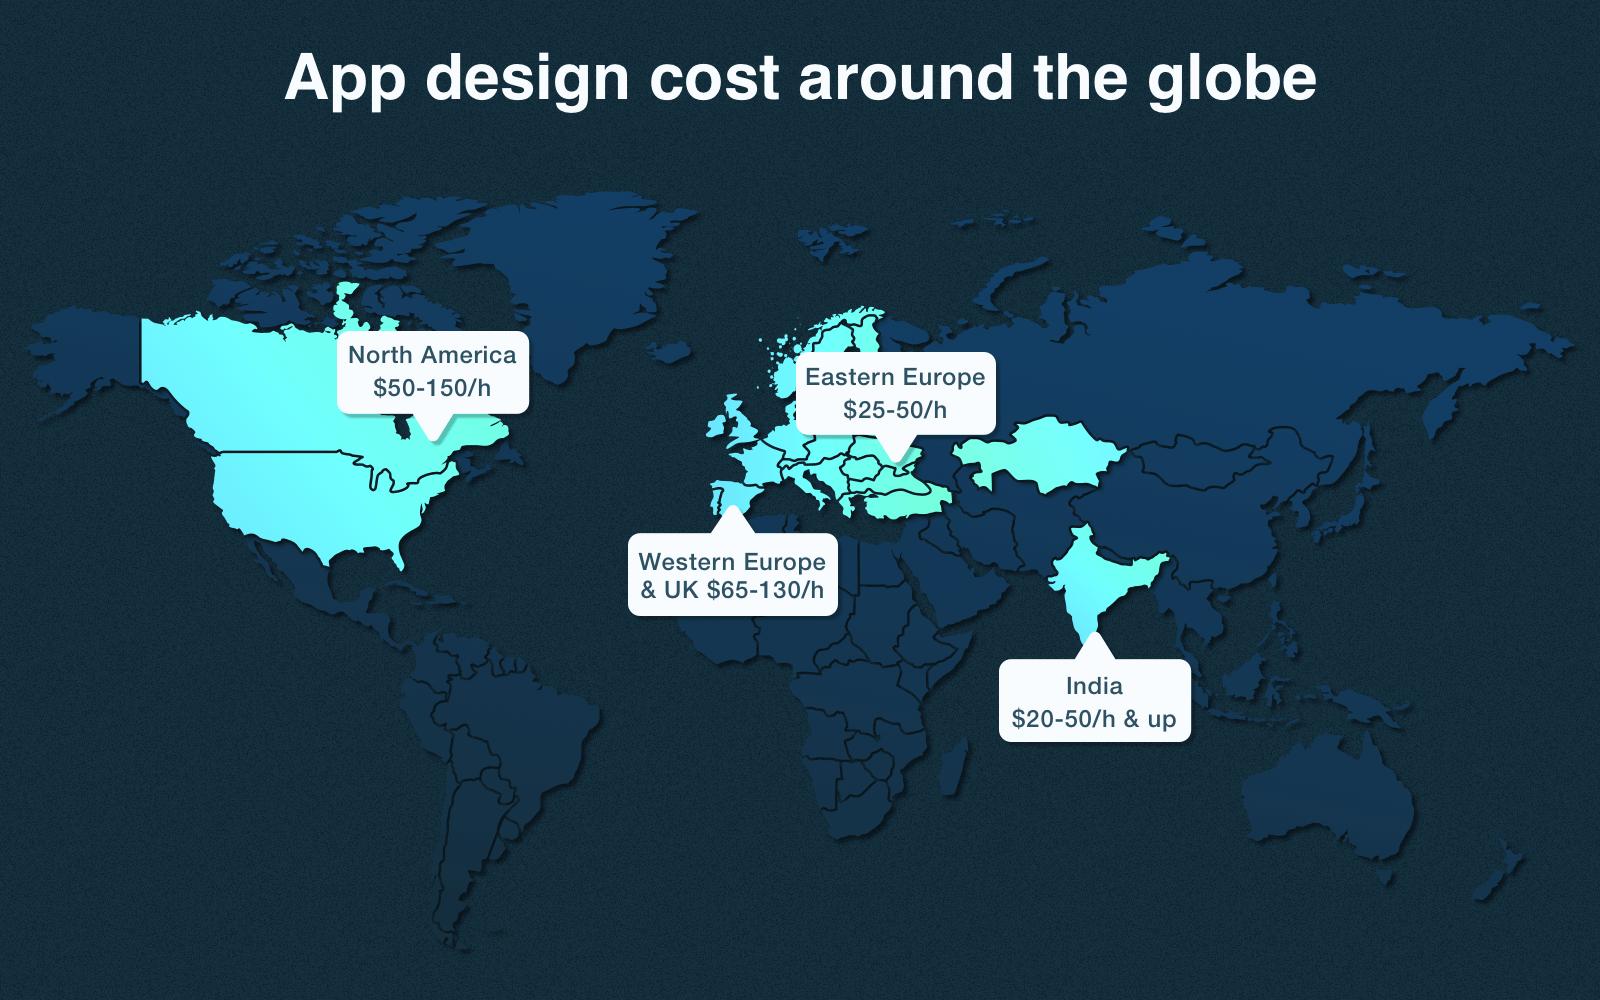 App design cost around the globe